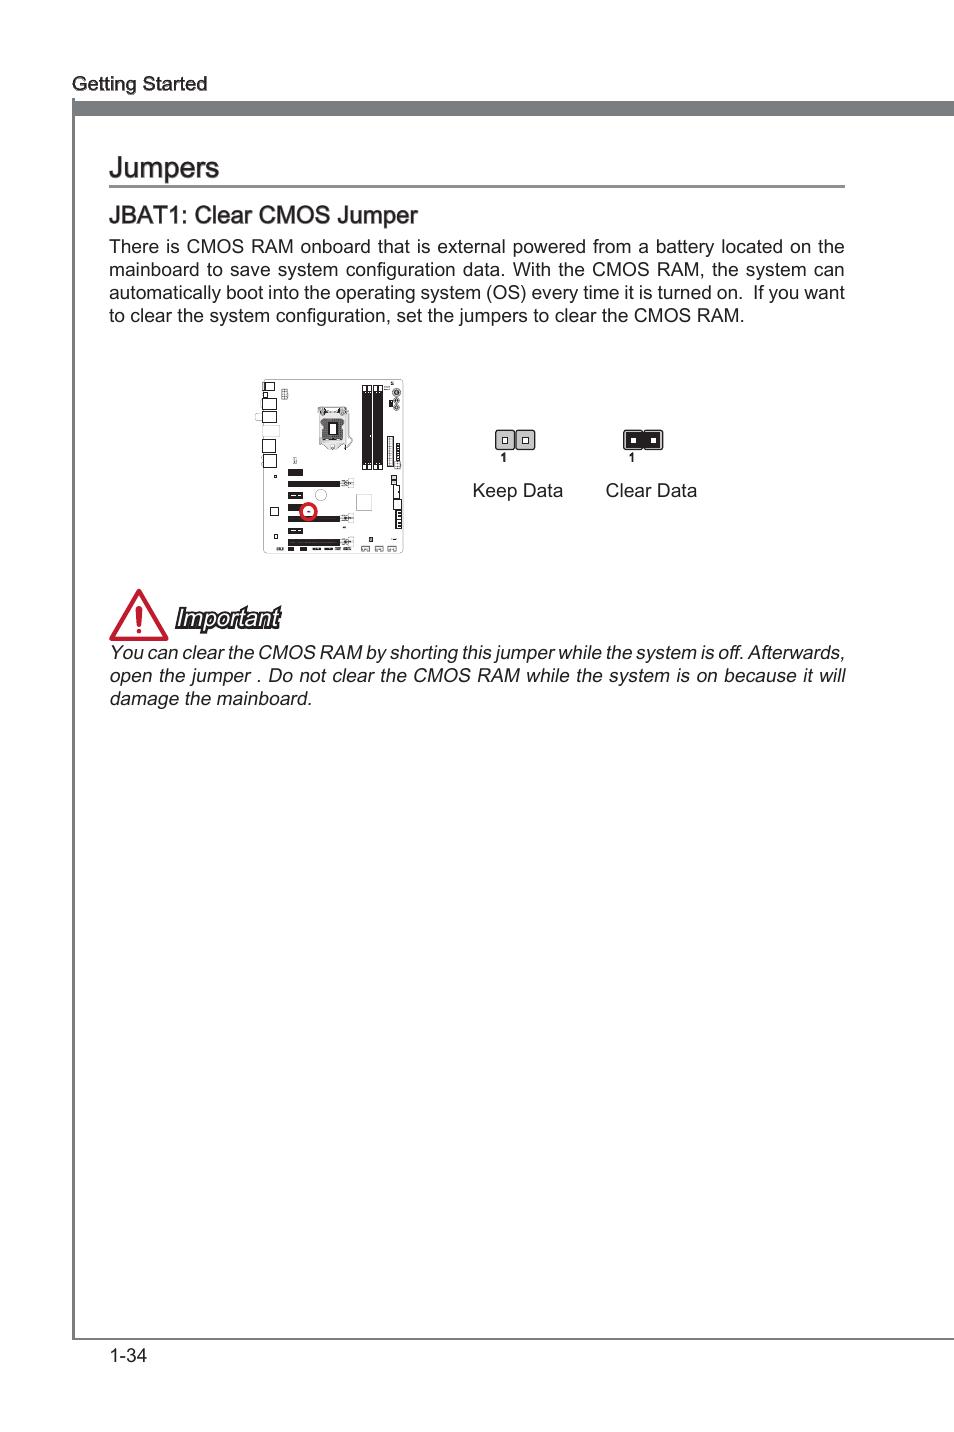 Jumpers -34, Jbat1, Clear cmos jumper | MSI Z77 MPOWER User